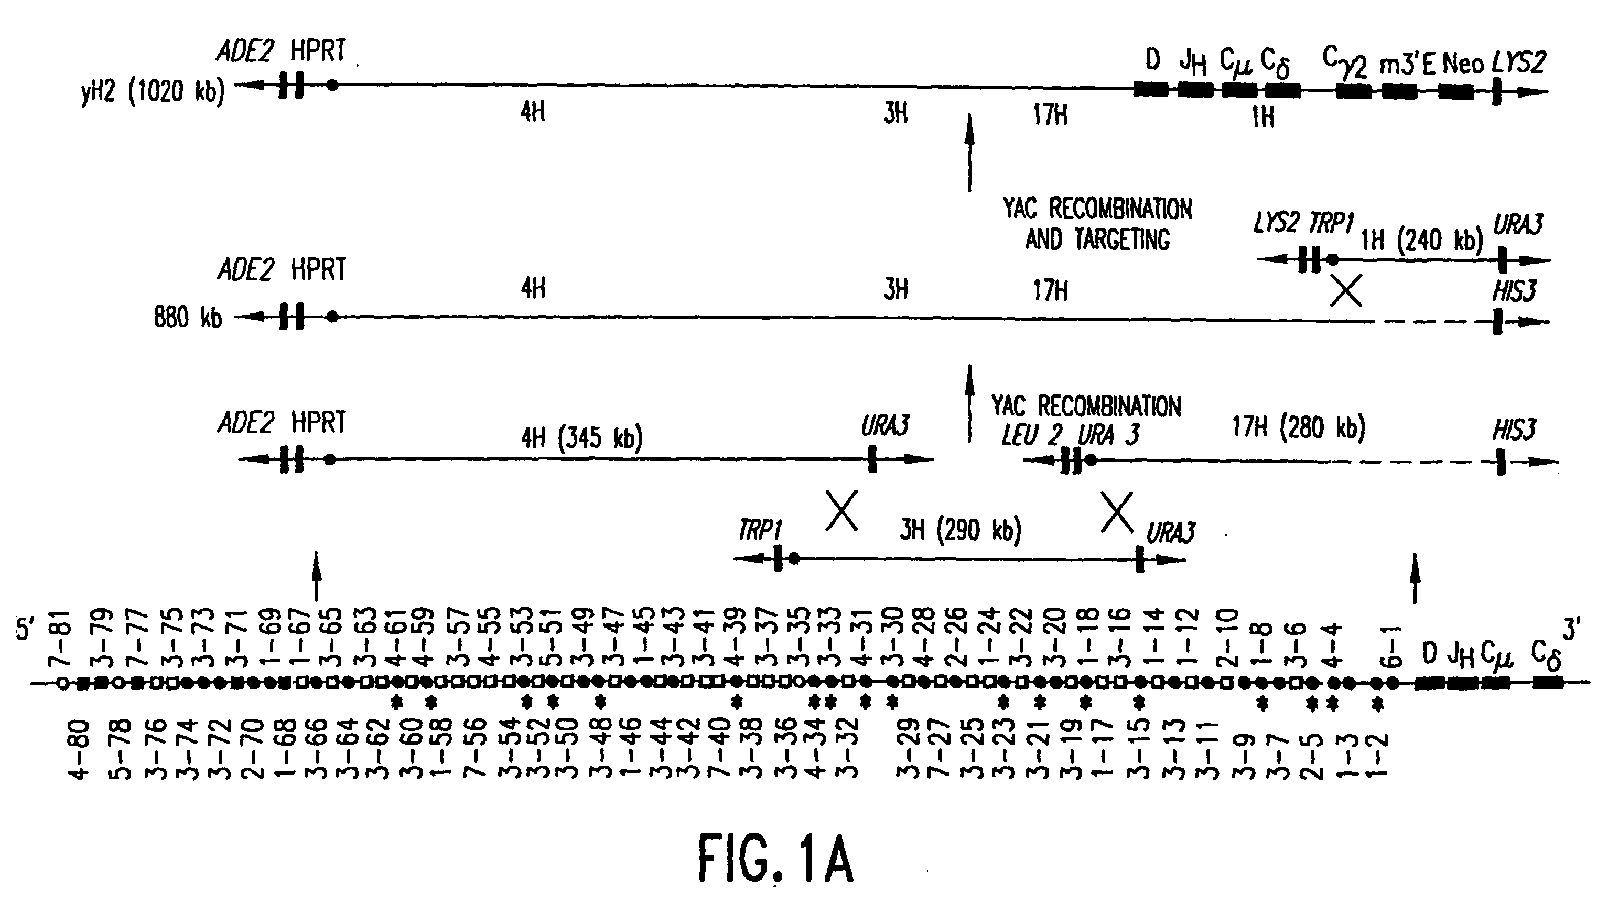 Abp 656 ep1972194a1 - transgenic mammals having human ig loci